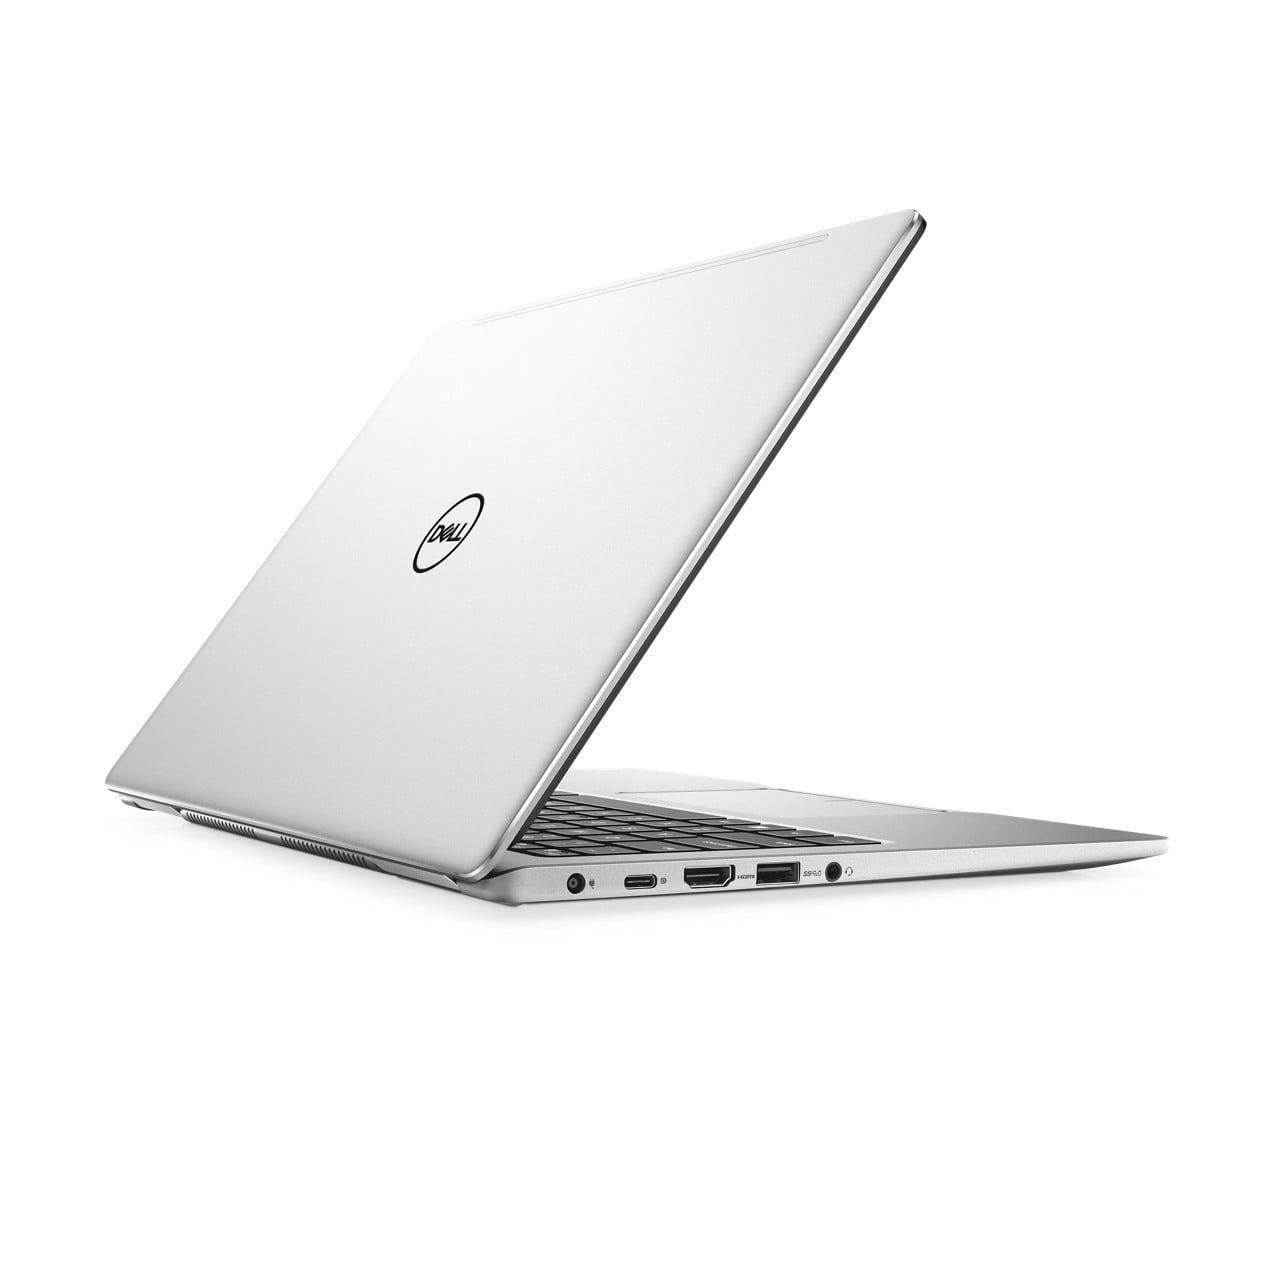 Dell Inspiron 13 7000, i7370-5725SLV, 13.3 FHD (1920 x 1080), Intel Core i5-8250U, 8GB 2400MHz DDR4, 256 GB (SSD), Intel UHD Graphics 620